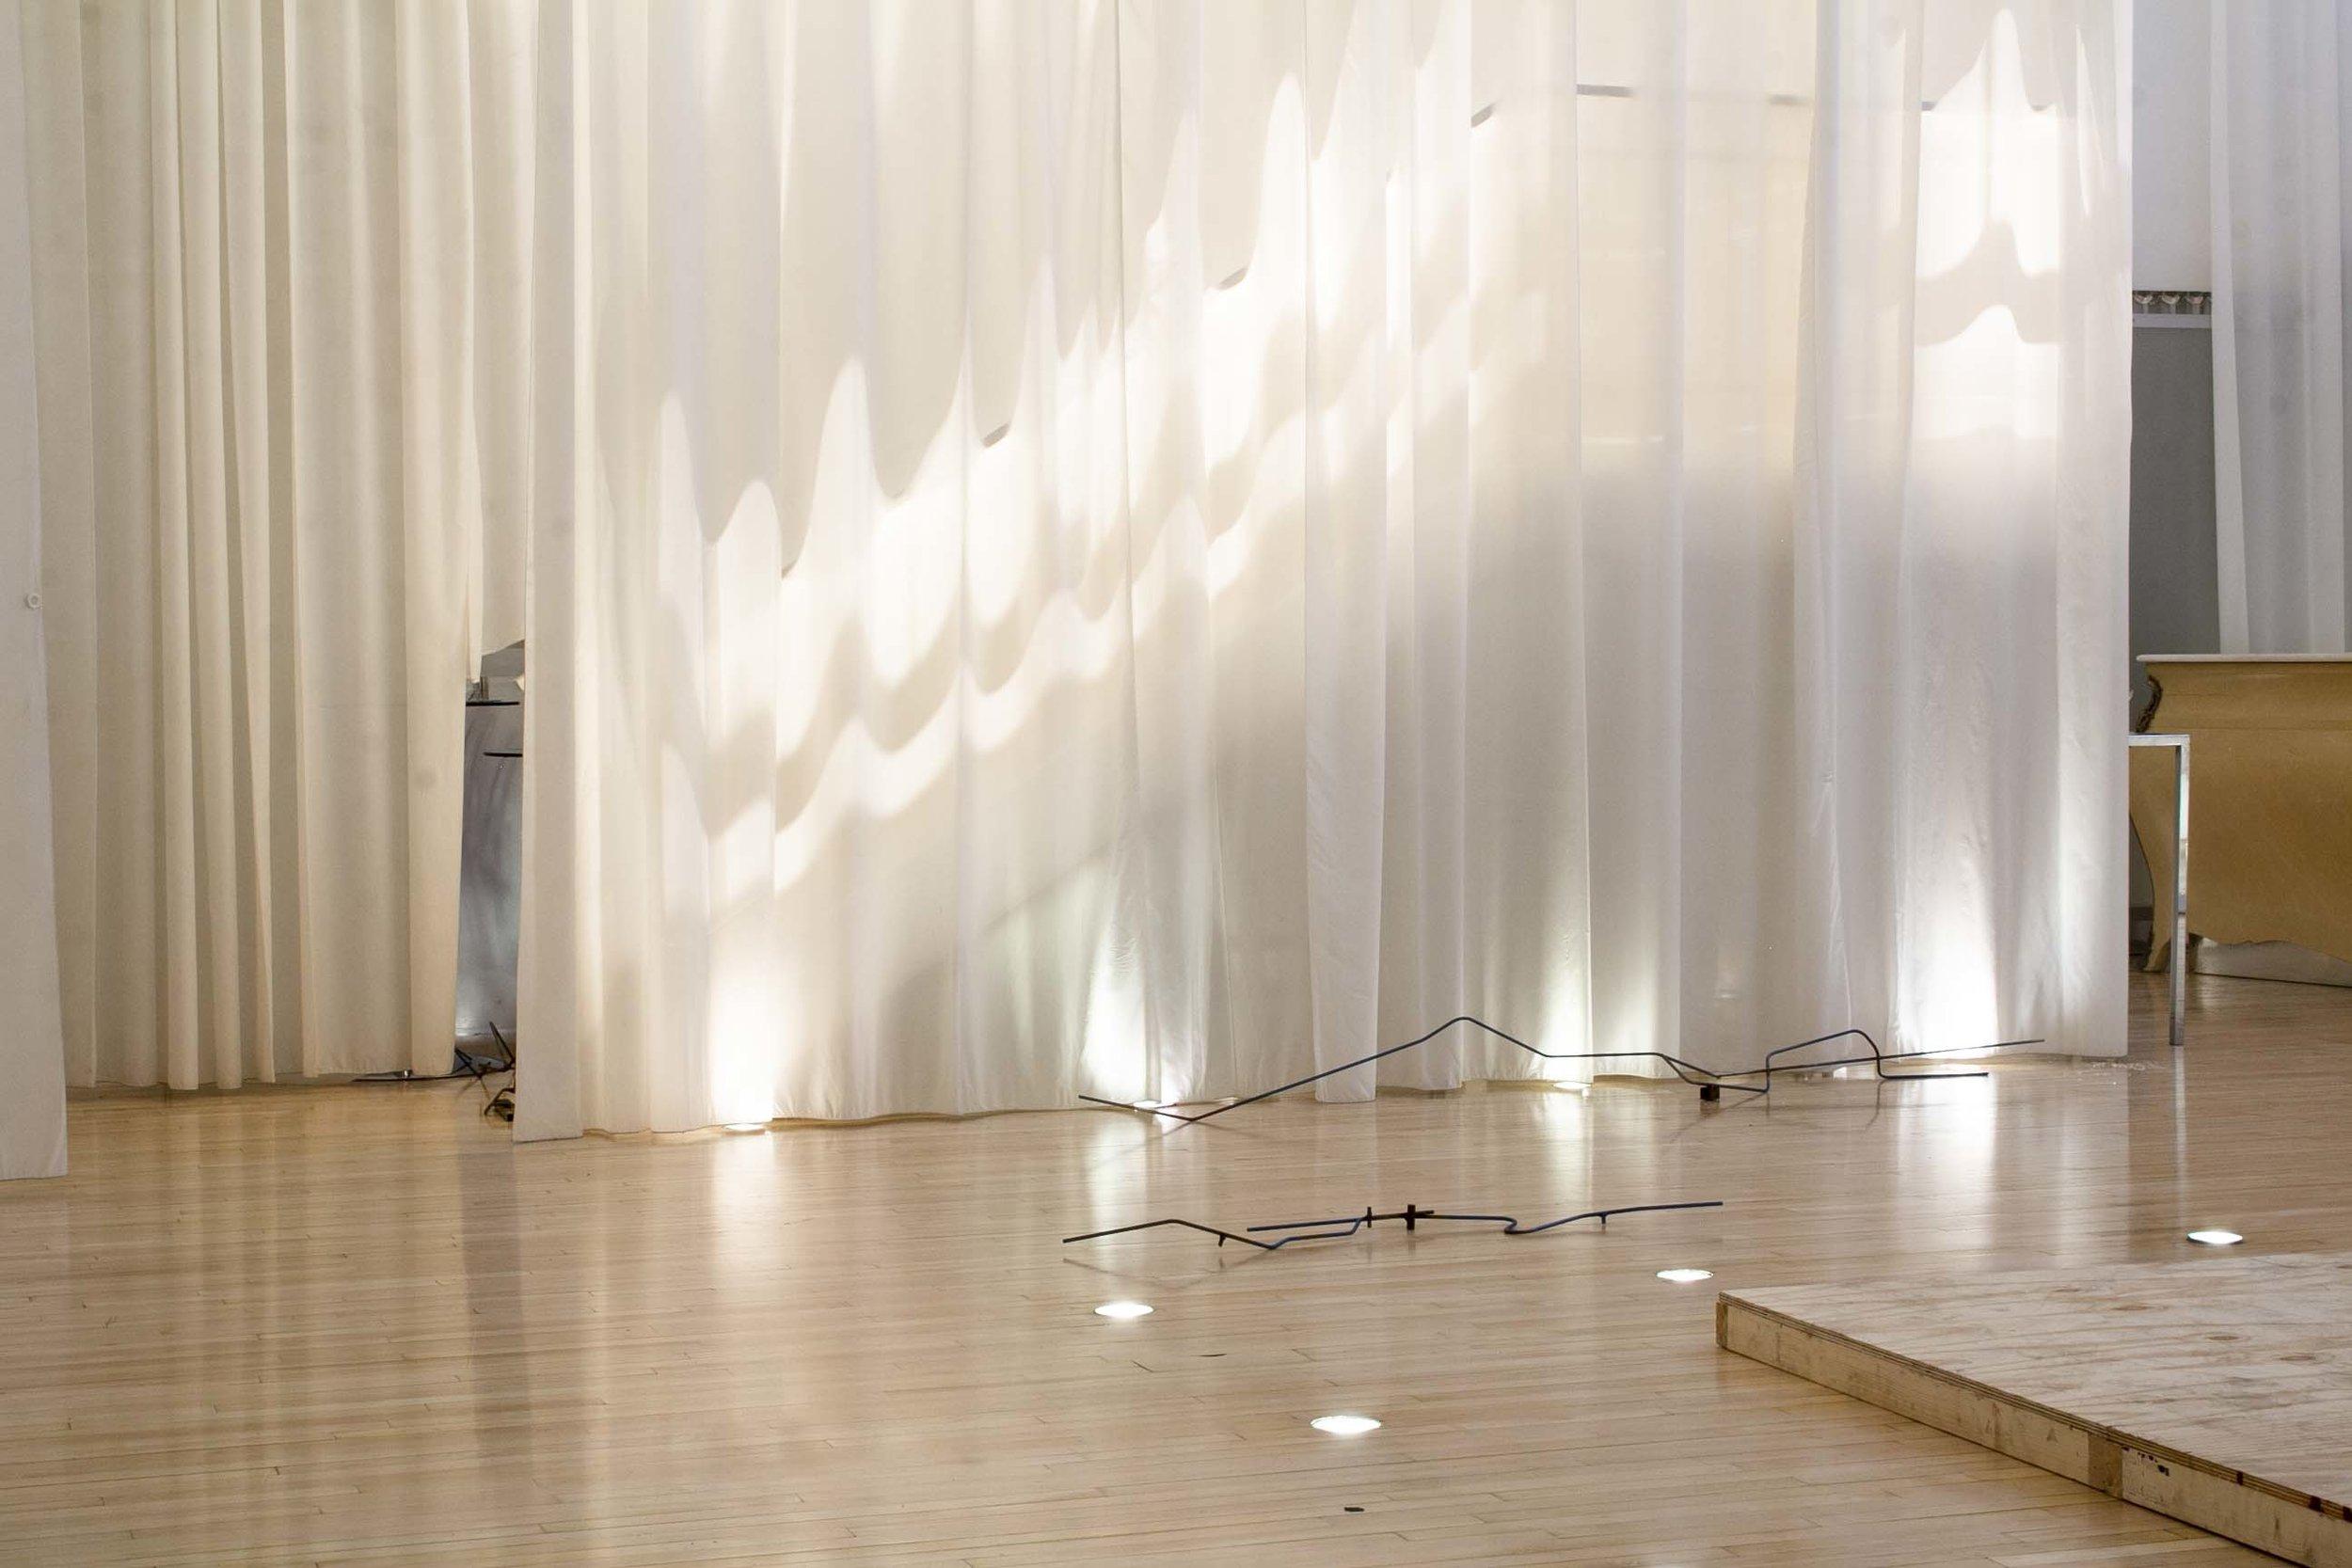 lub-dub-lub-dub-lub-dub… (when I stumble) 2019 installation views at Dazzling Encounters curated by Cristina Herráiz Peleteiro at Sanderson Hotel London UK